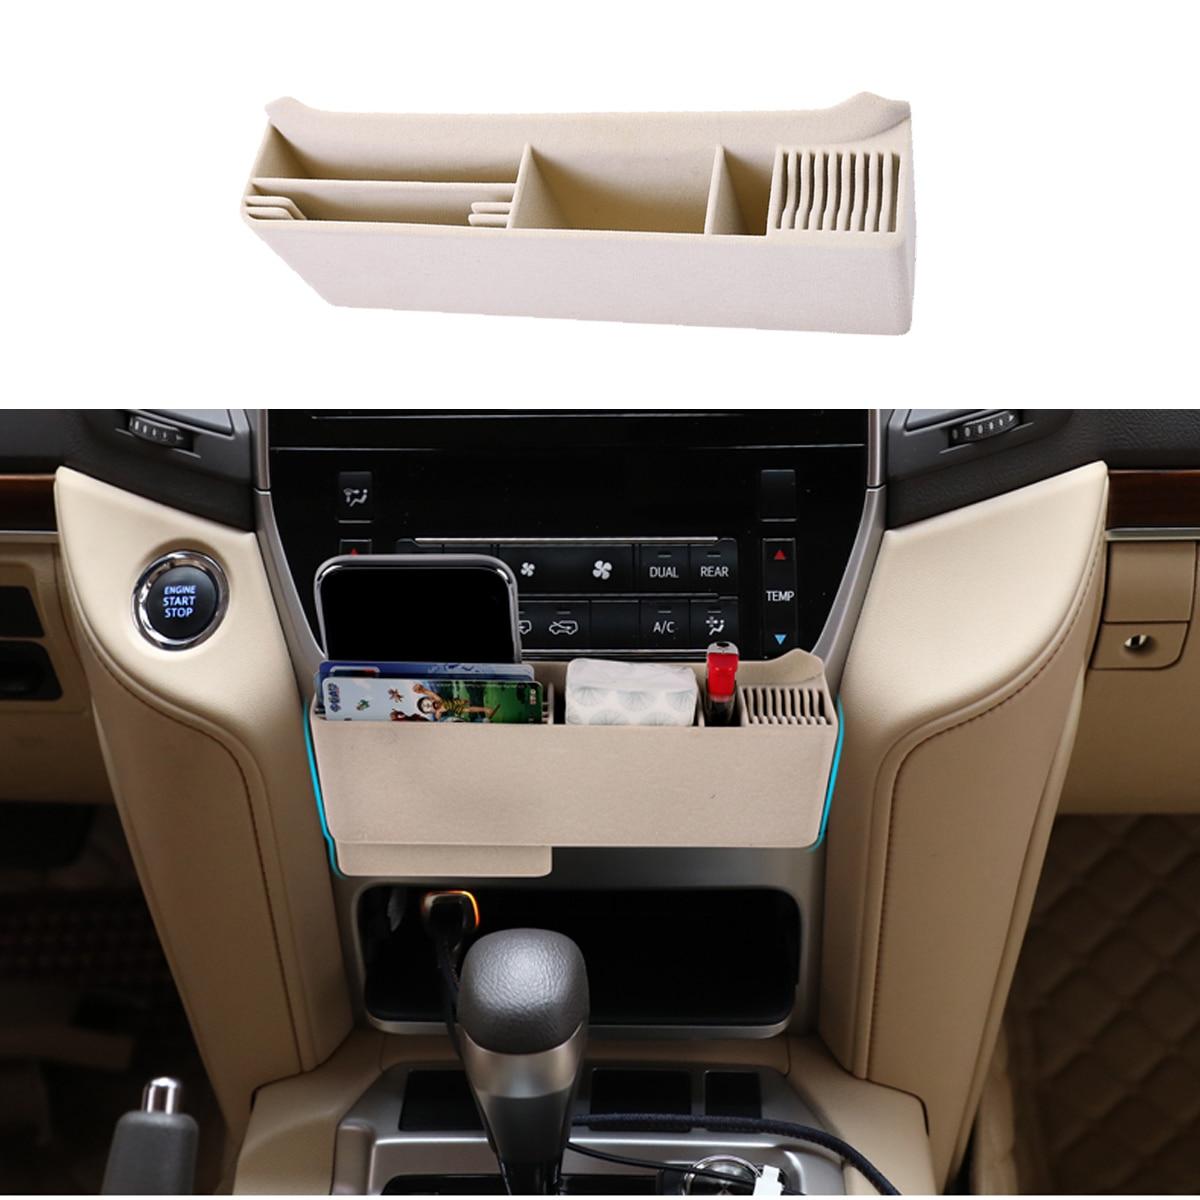 Car Central Control Storage Box Card Storage Frame For Toyota Land Cruiser 200 2016 2017 2018 2019 Car Accessories